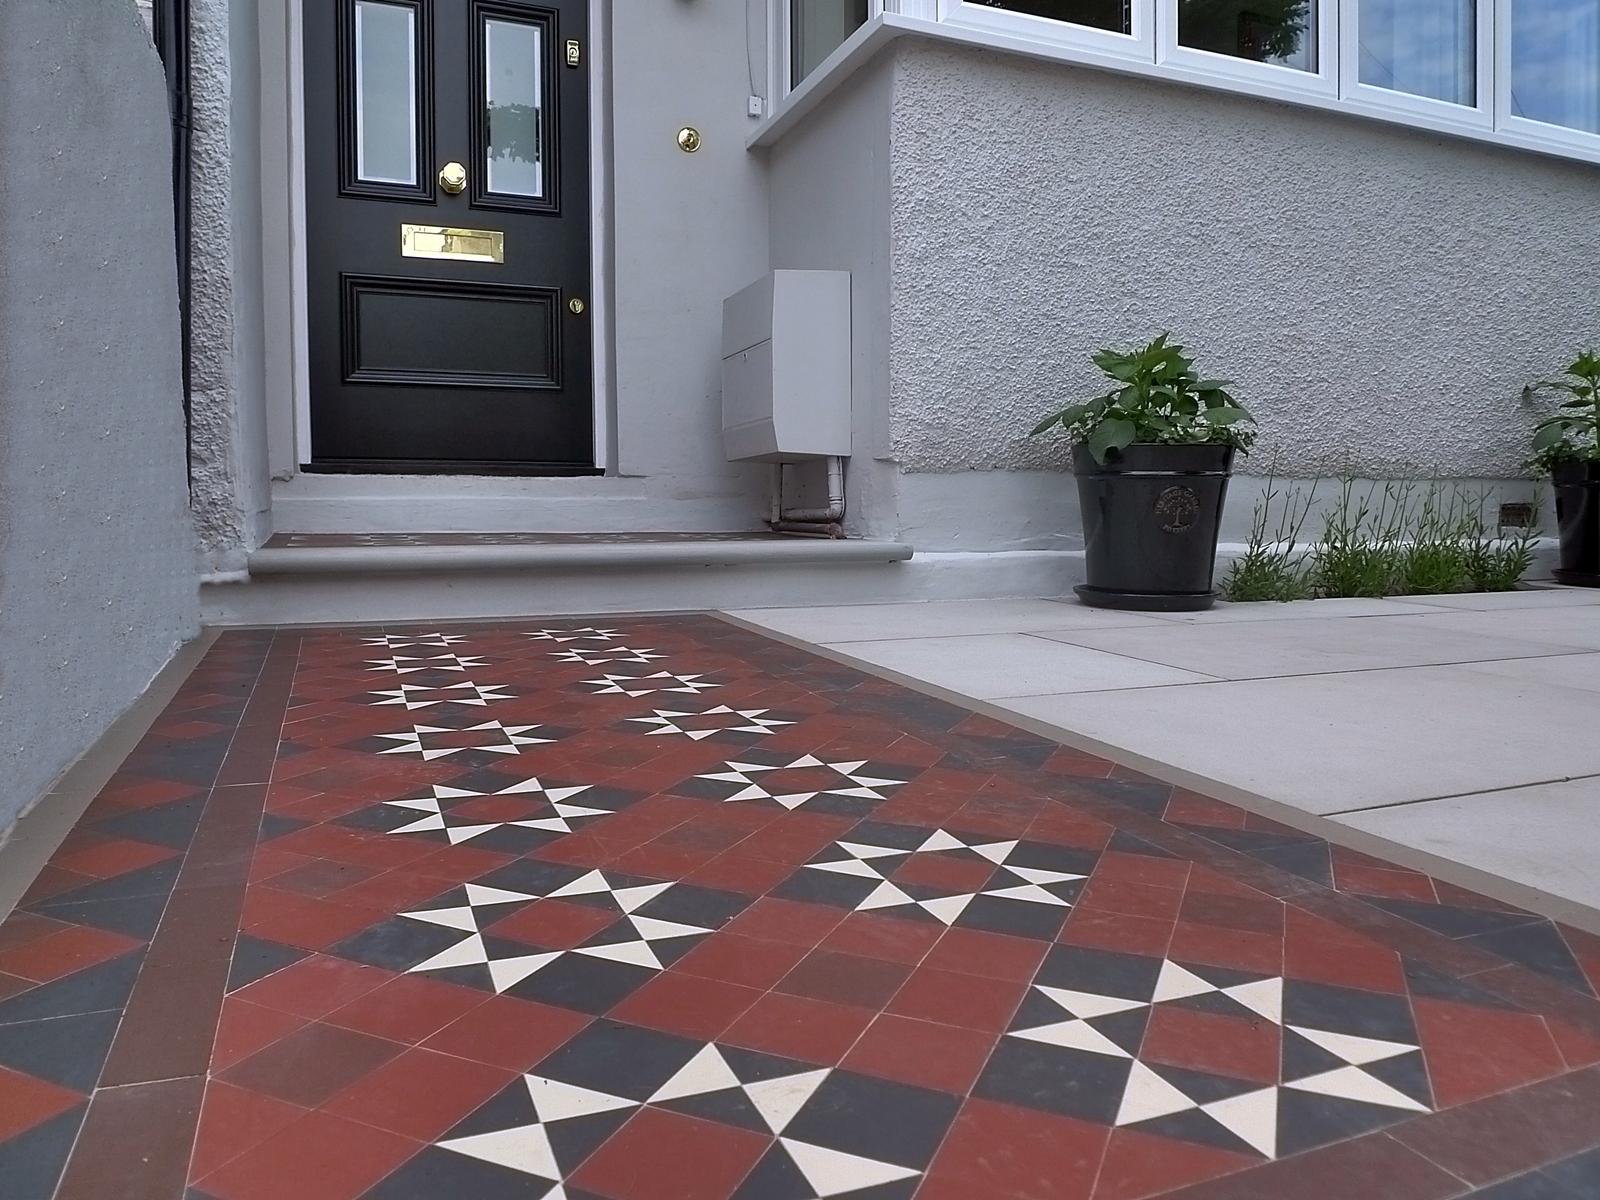 victorian mosaic tile path mosaic man front garden company balham clapham battersea putney kensington mayfair westminster london